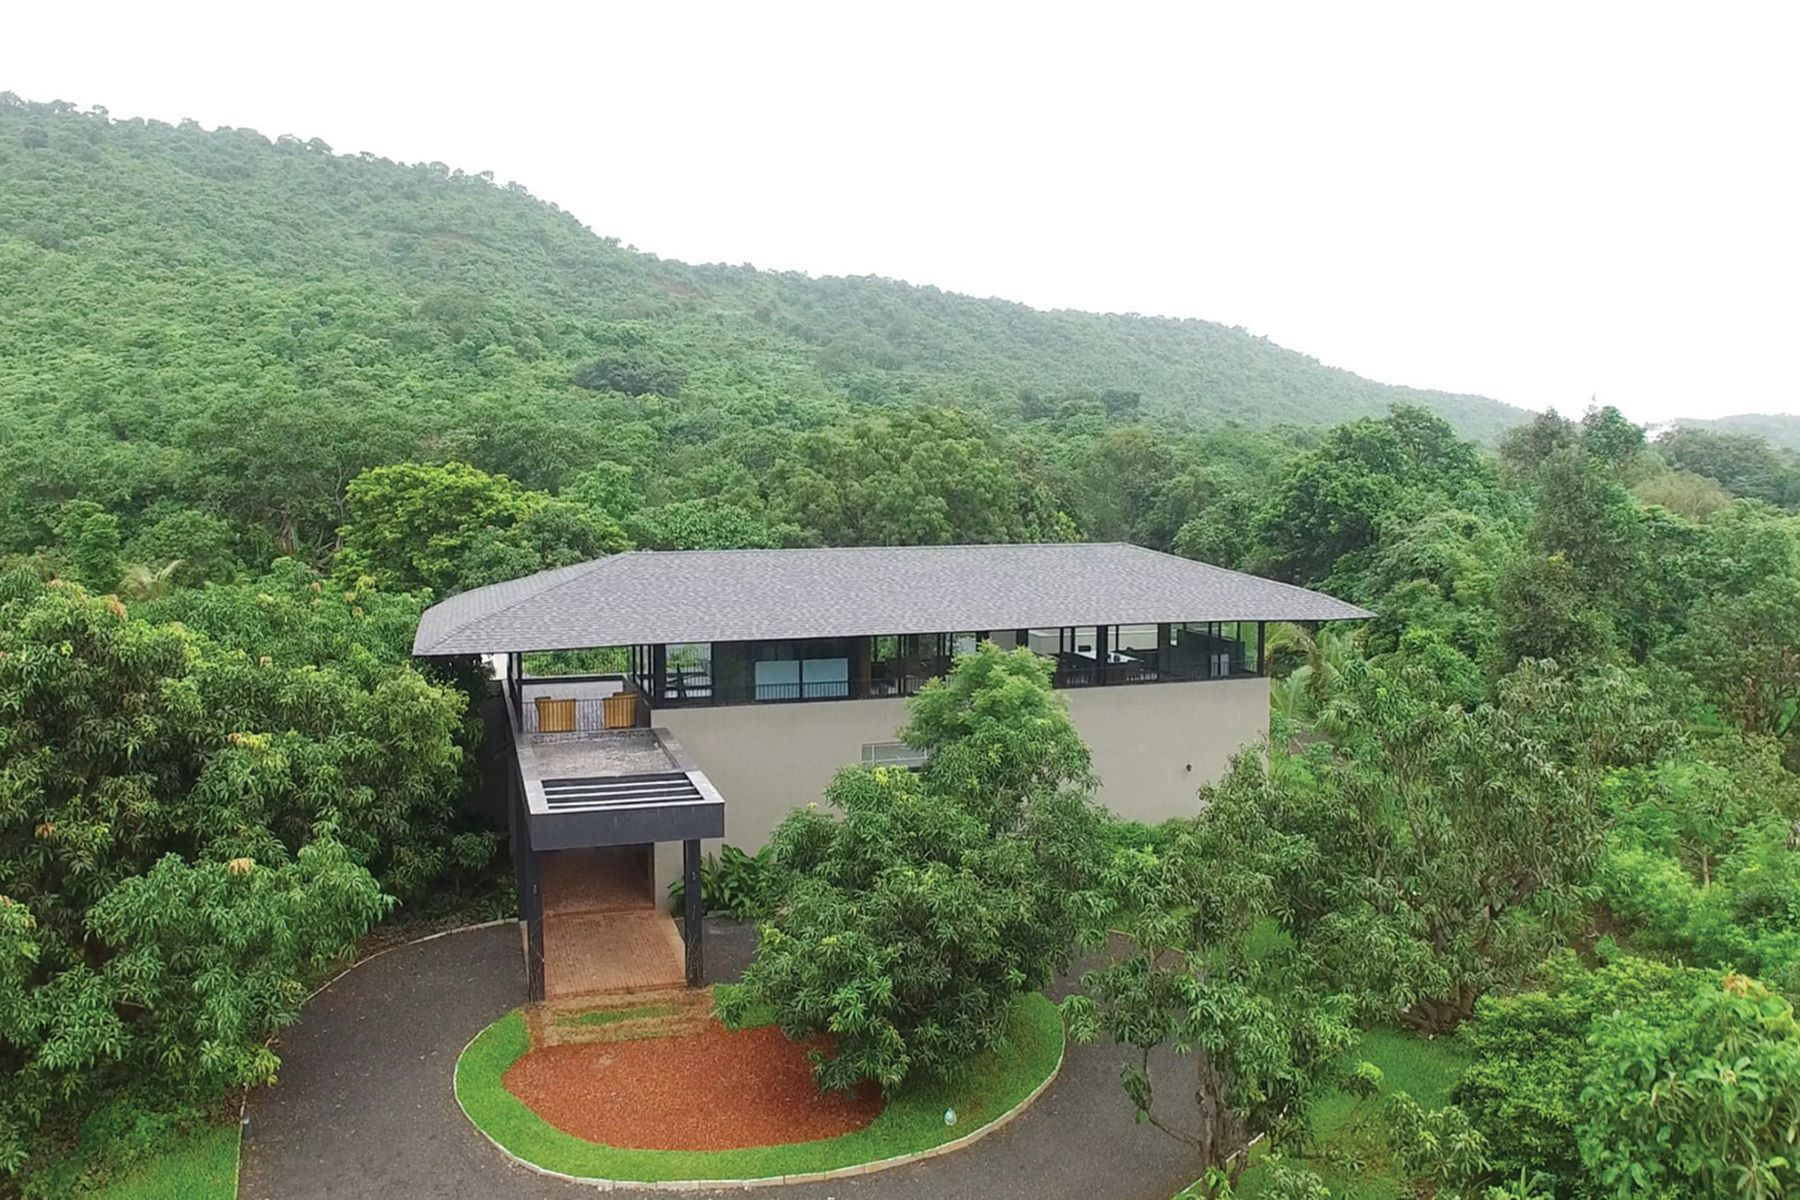 Ferme / Ranch / Plantation pour l à vendre à Alibaug - Luxury Villa with its own Private Mangrove and Courtyards Mathroli, Autres Maharashtra, Maharashtra, 402209 Inde